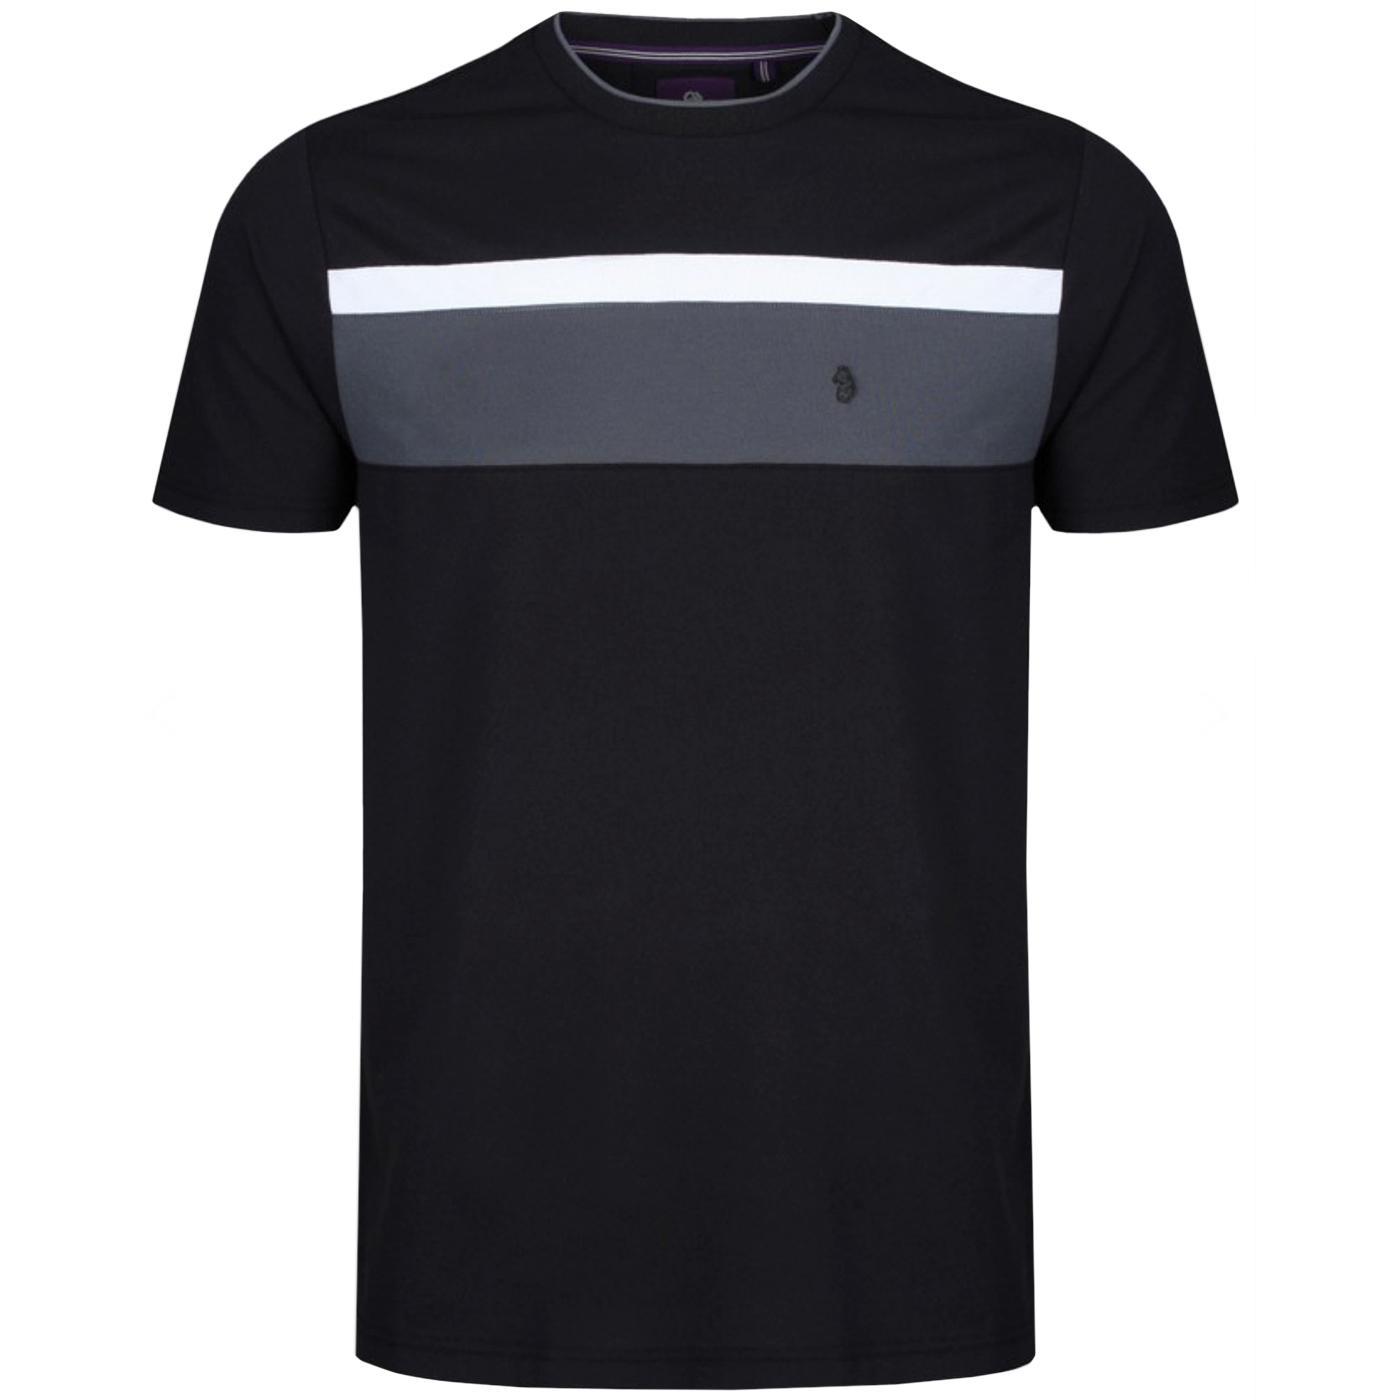 Indy Nial LUKE Men's Retro Pique Cotton T-Shirt